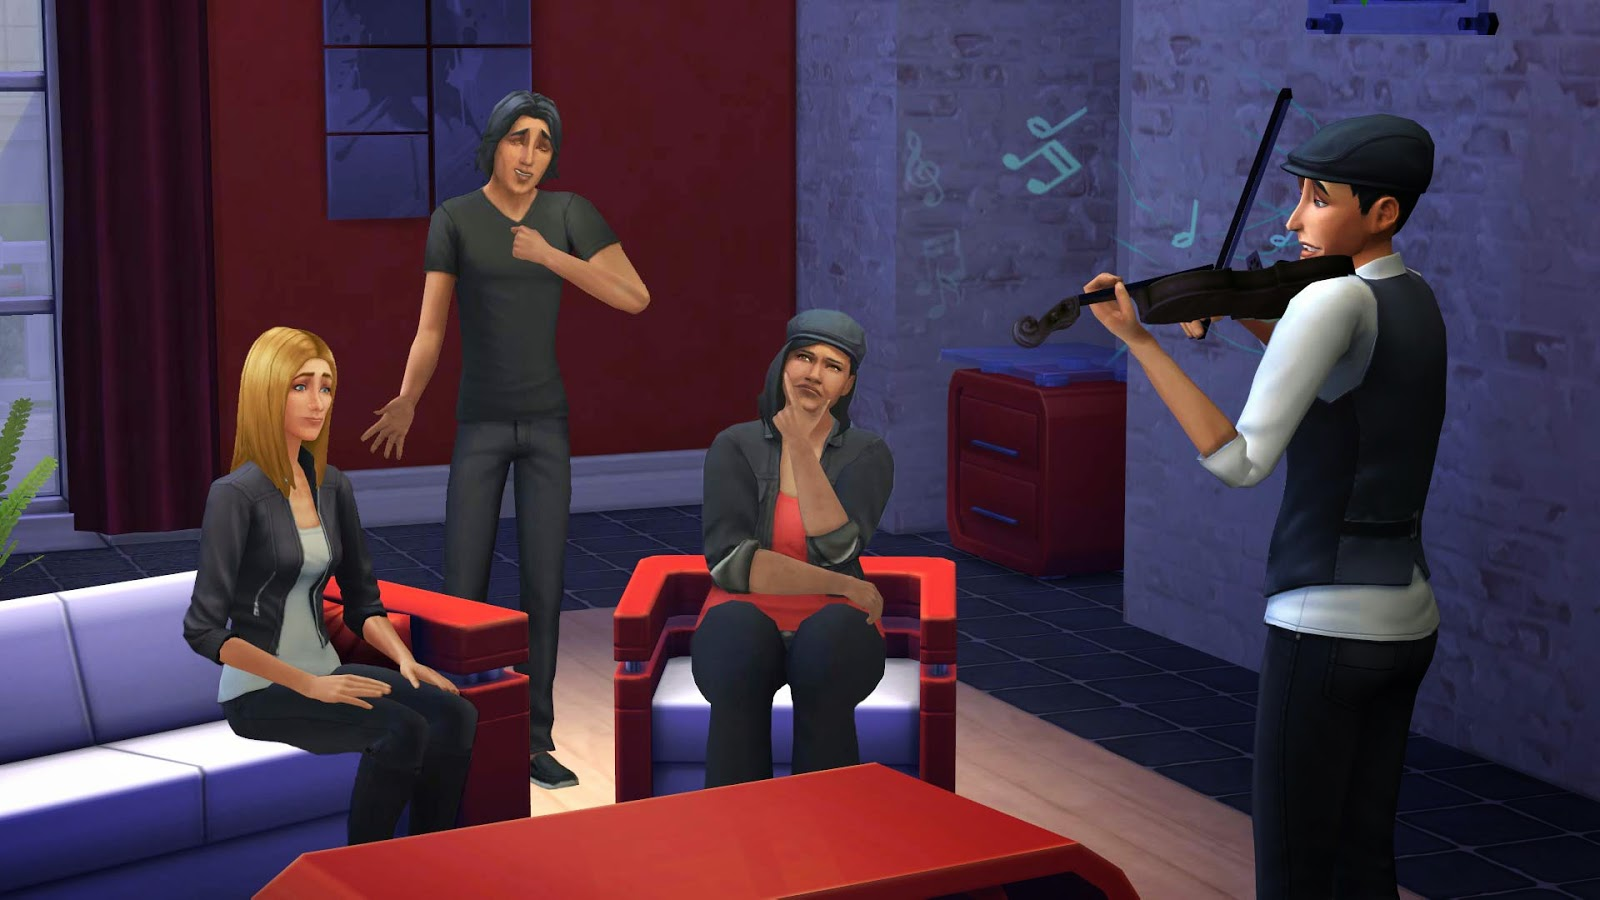 Allt Om Sims